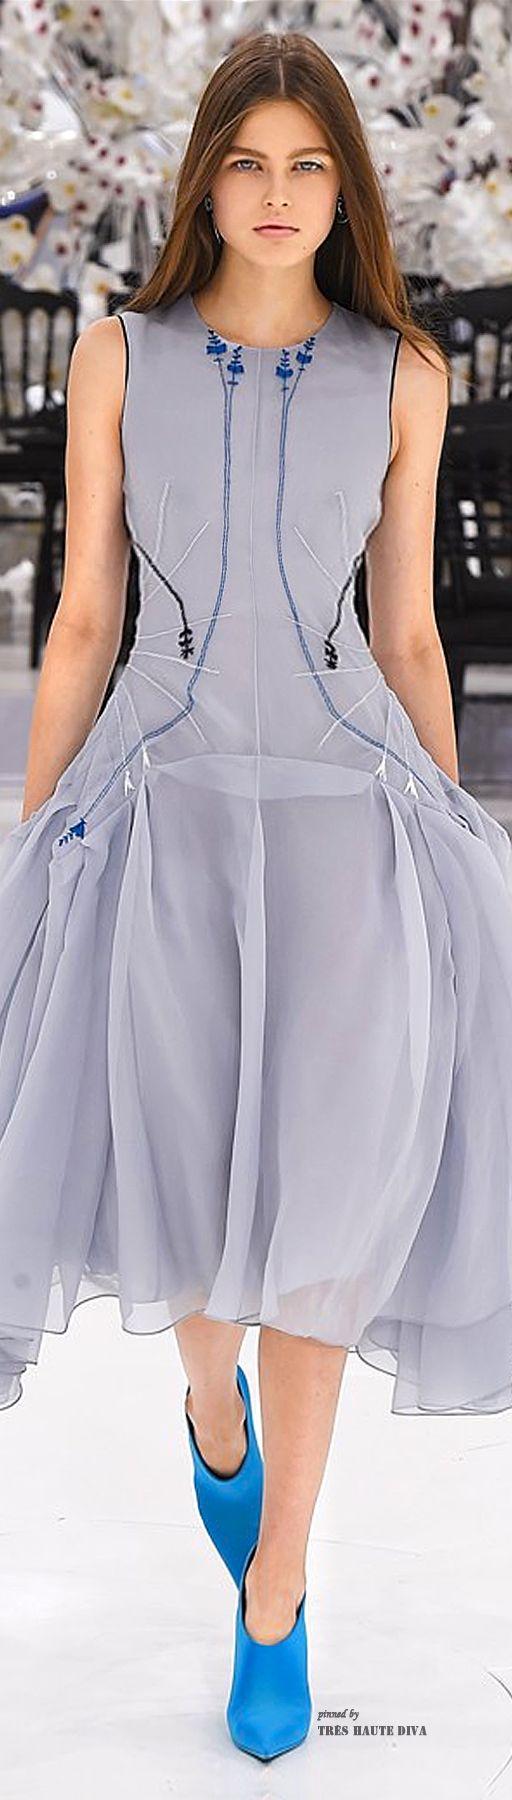 Christian Dior Haute Couture Autumn/Winter 2014-2015 |